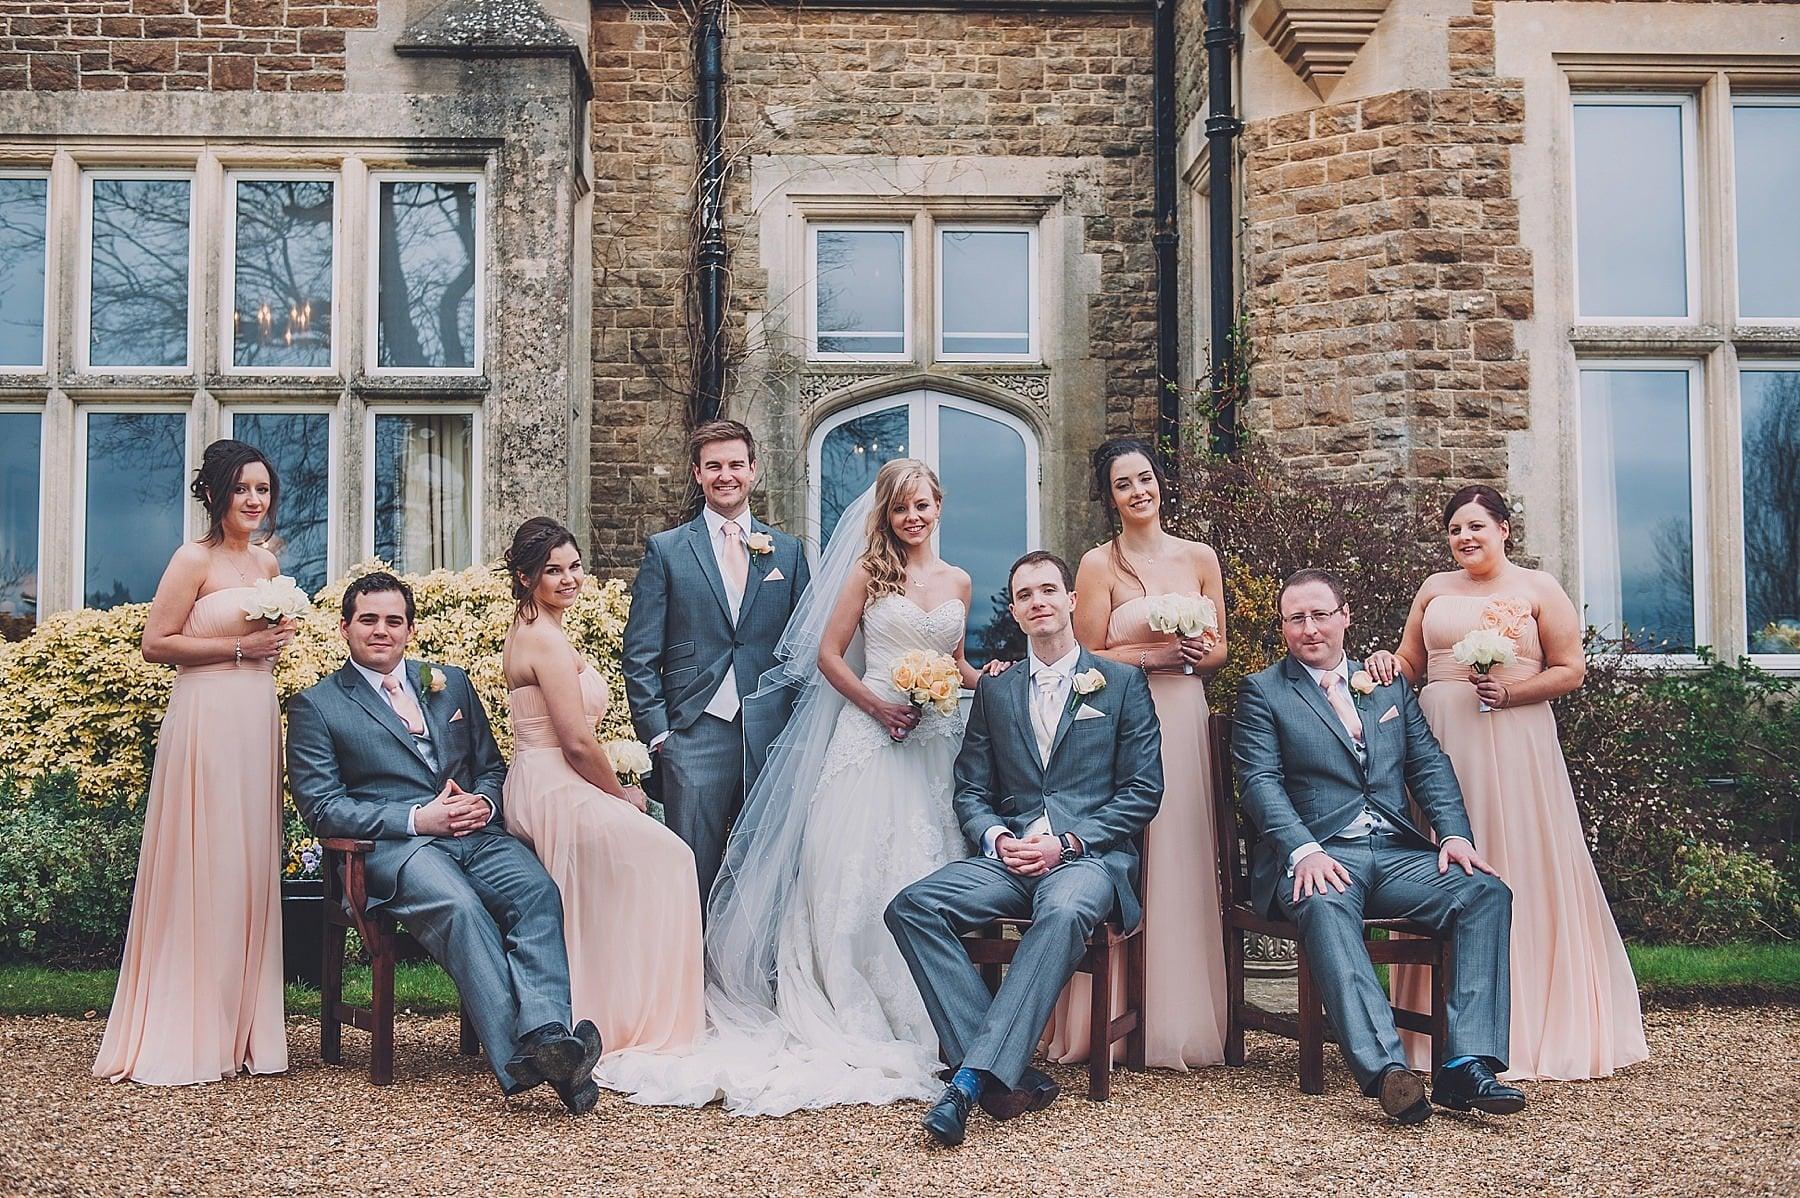 Stacey gurney wedding